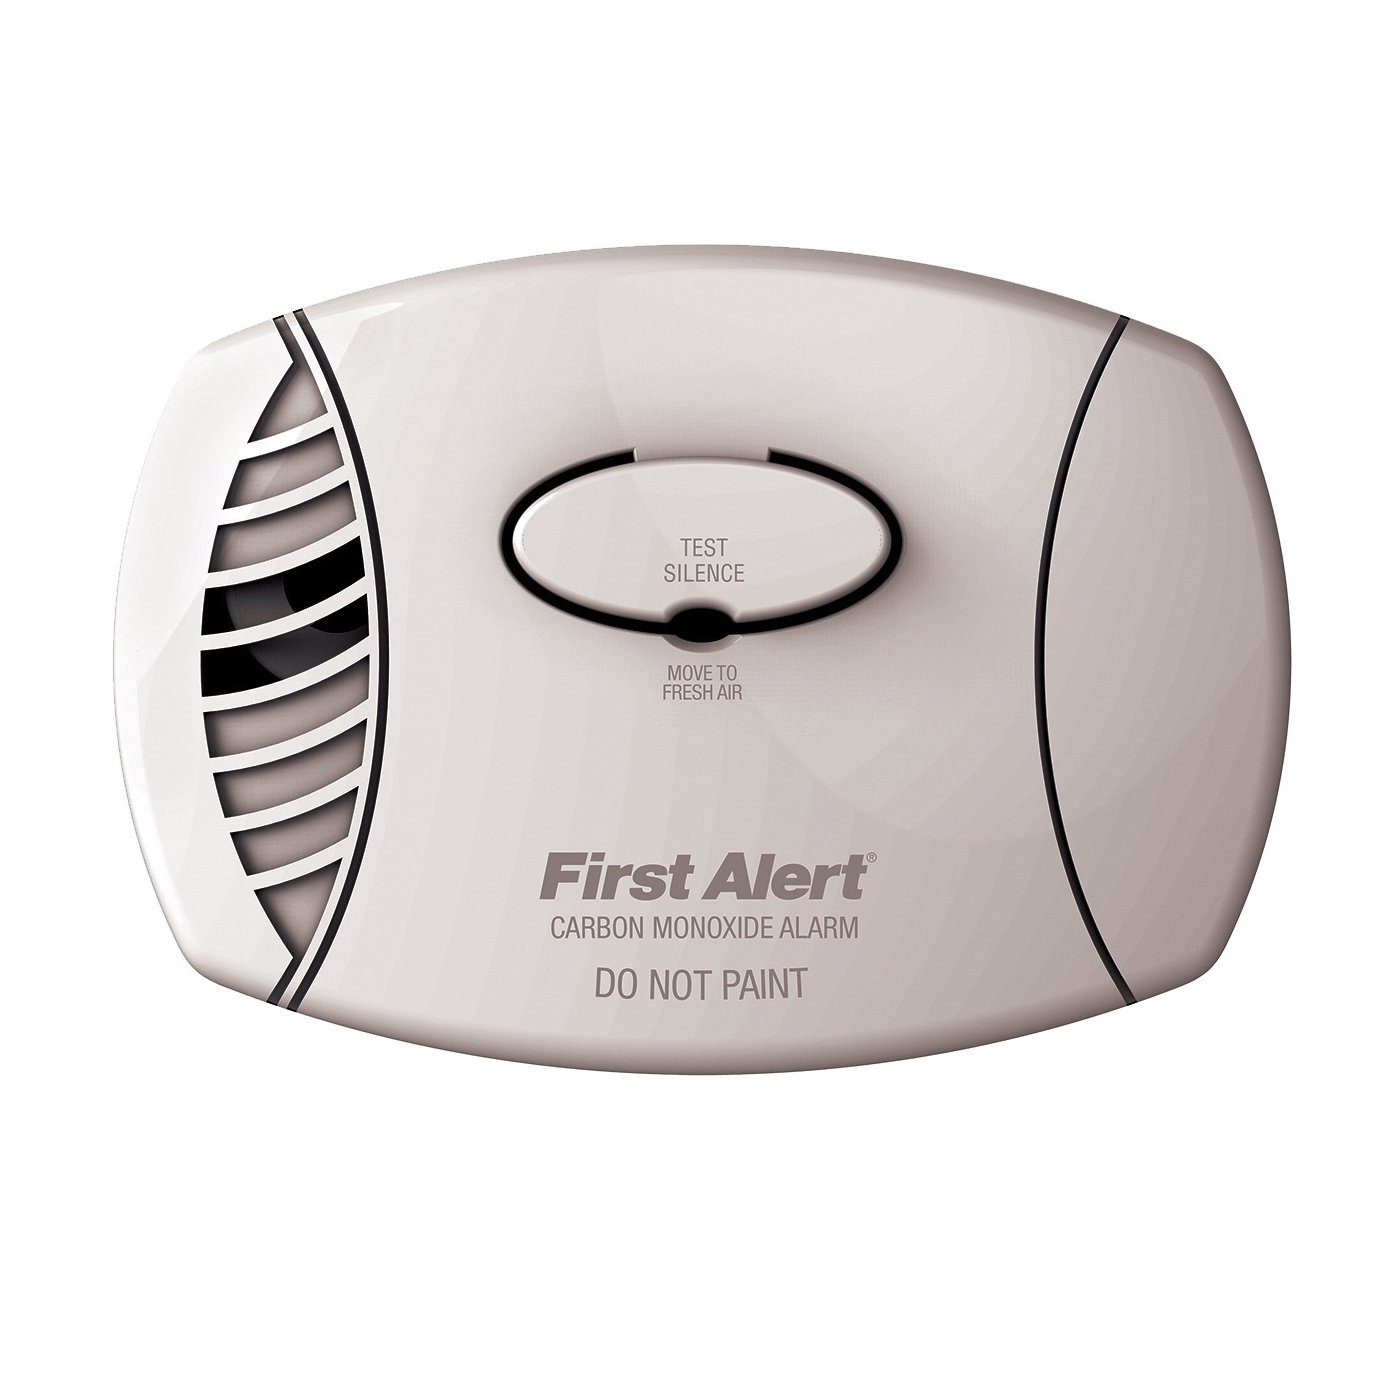 Picture of FIRST ALERT CO605 Carbon Monoxide Detector, 85 dB, Alarm: Low Battery, Electrochemical Sensor, White